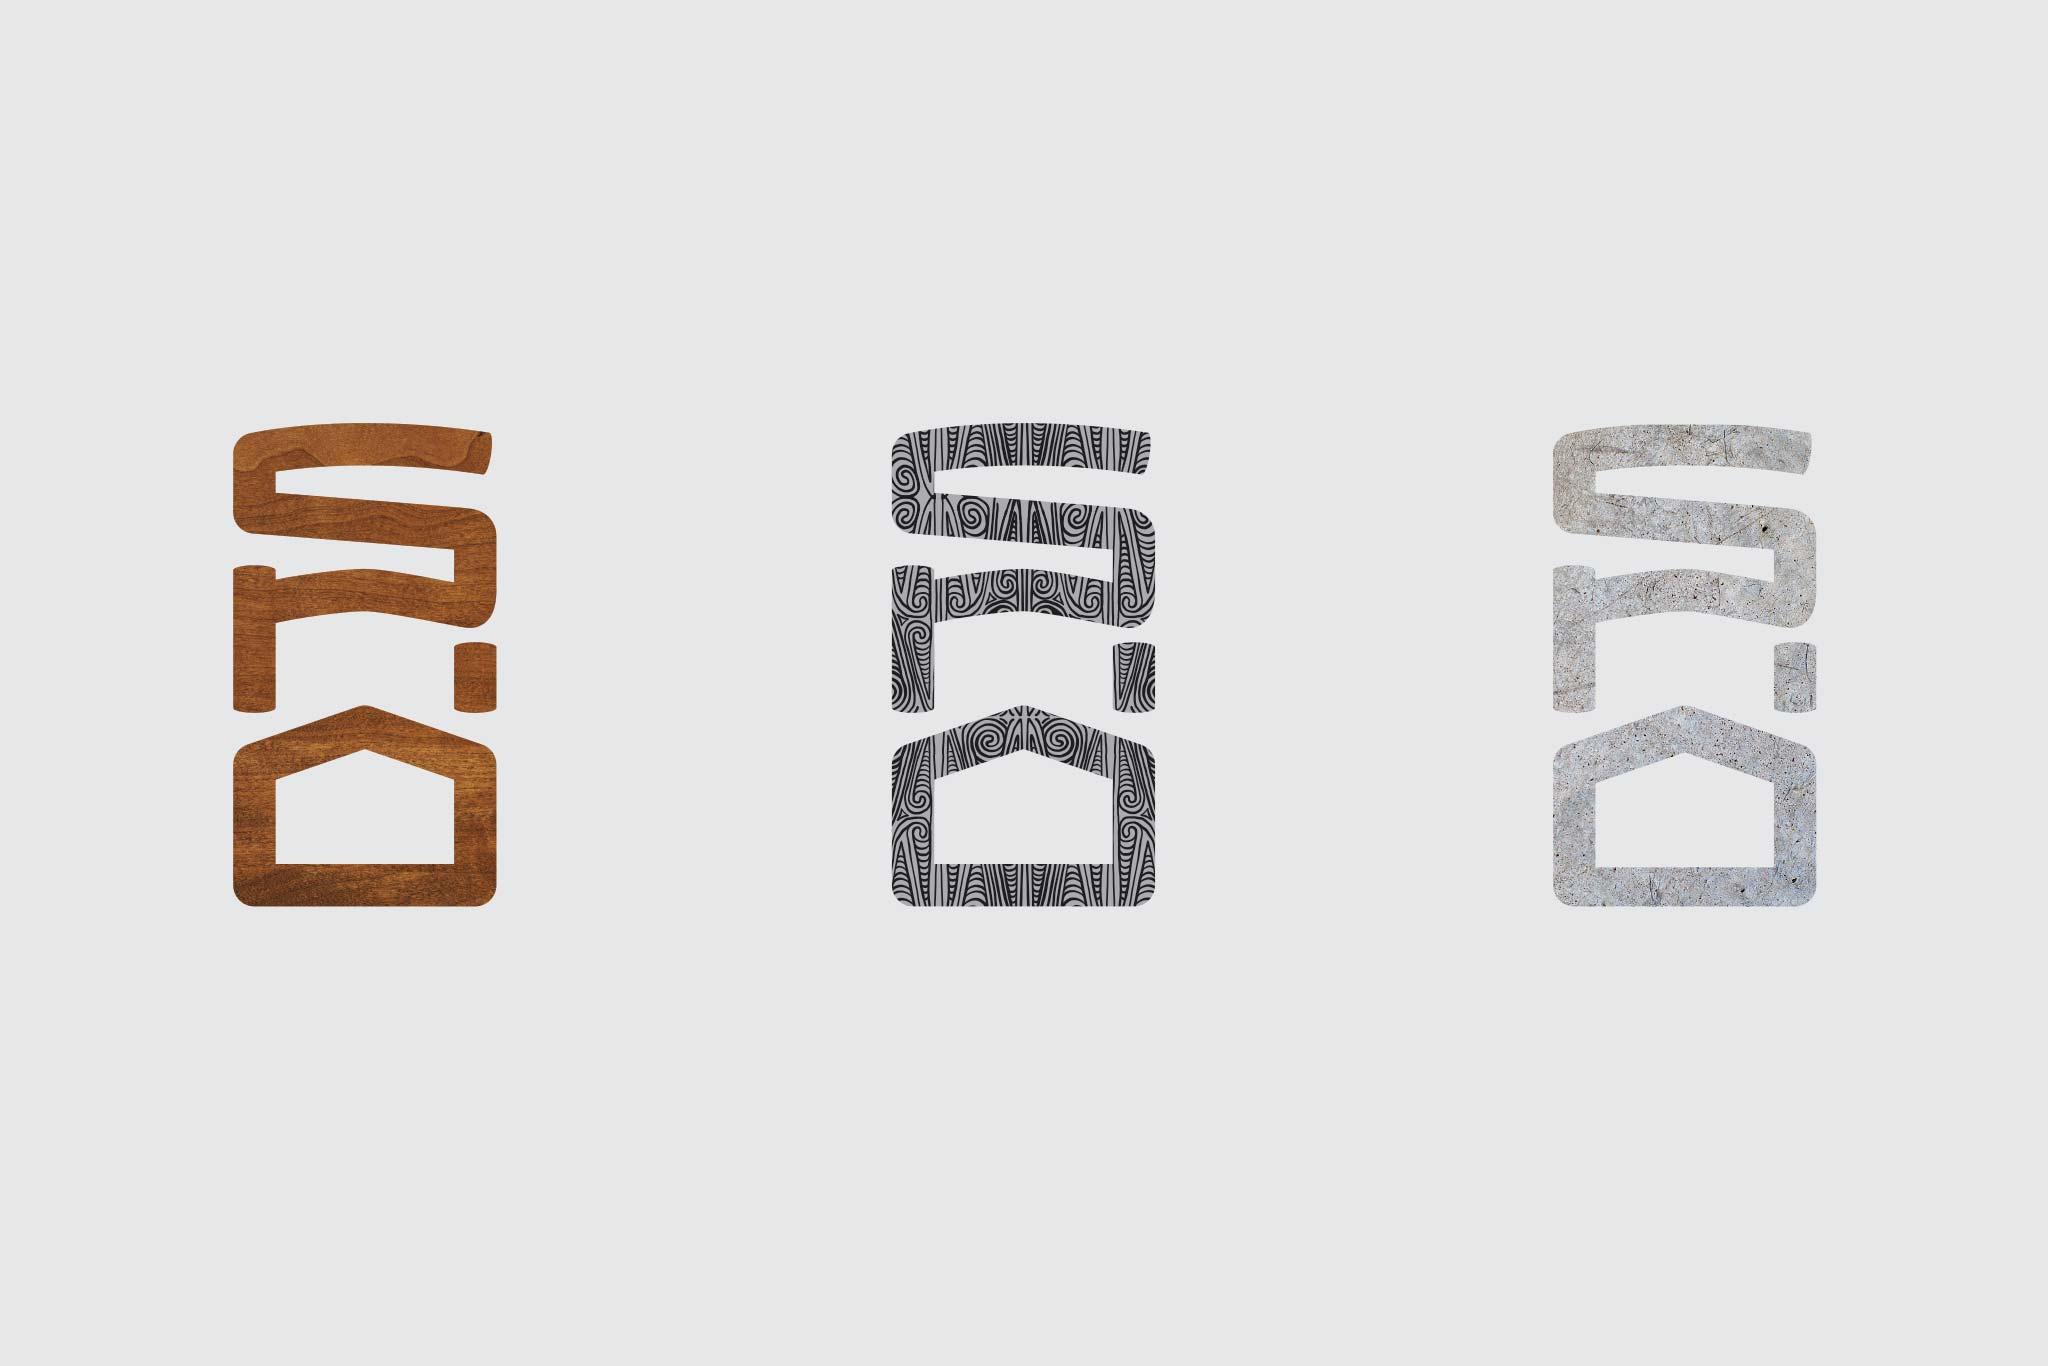 build-wth-sno-branding_3